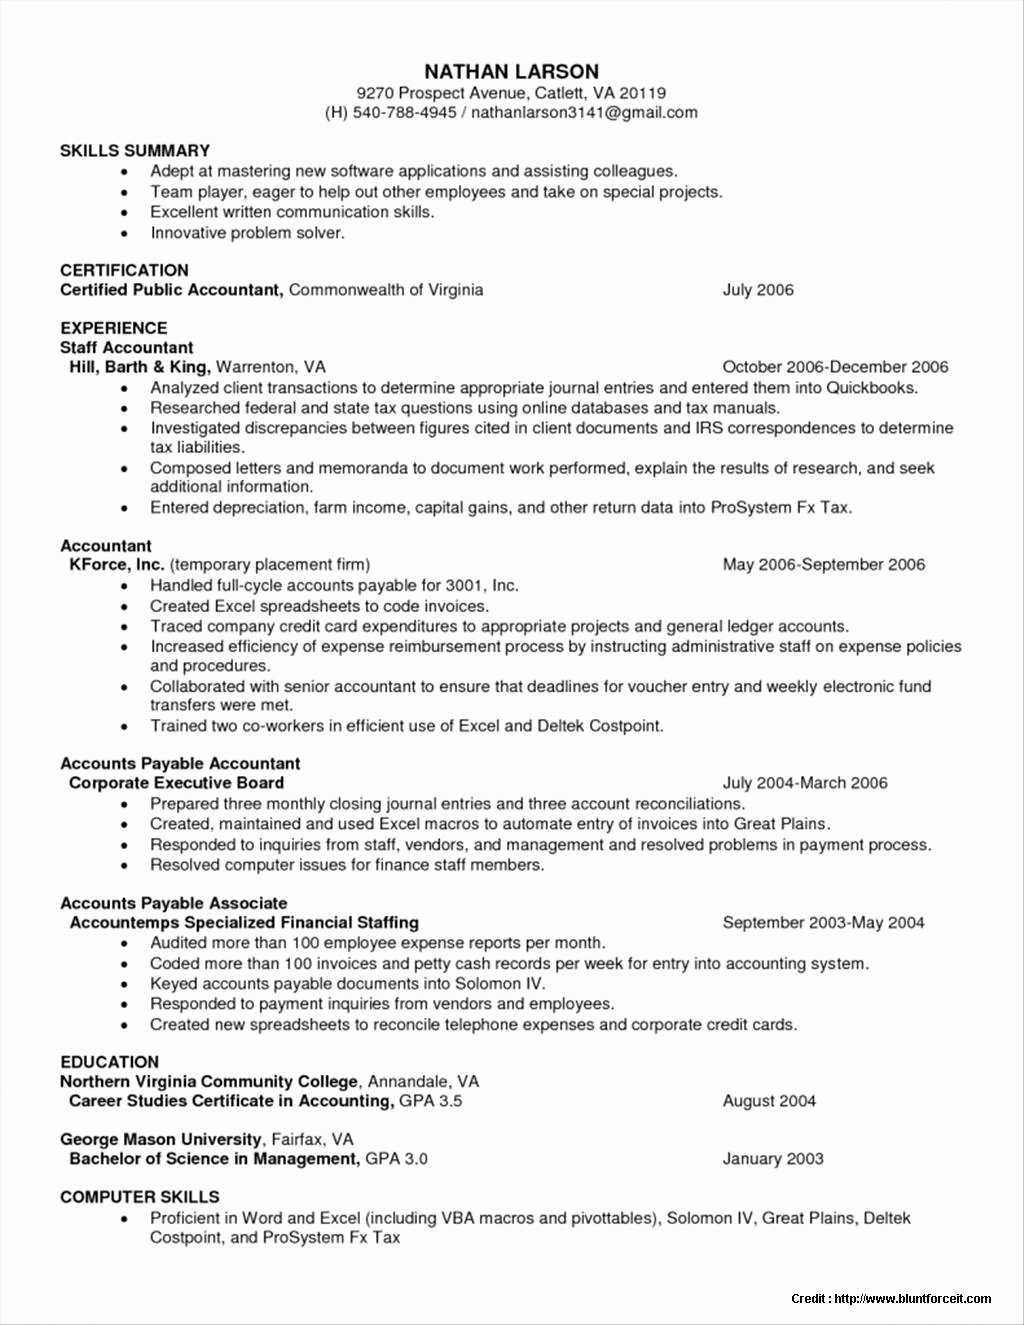 100 Free Resume Templates Download Resume Resume